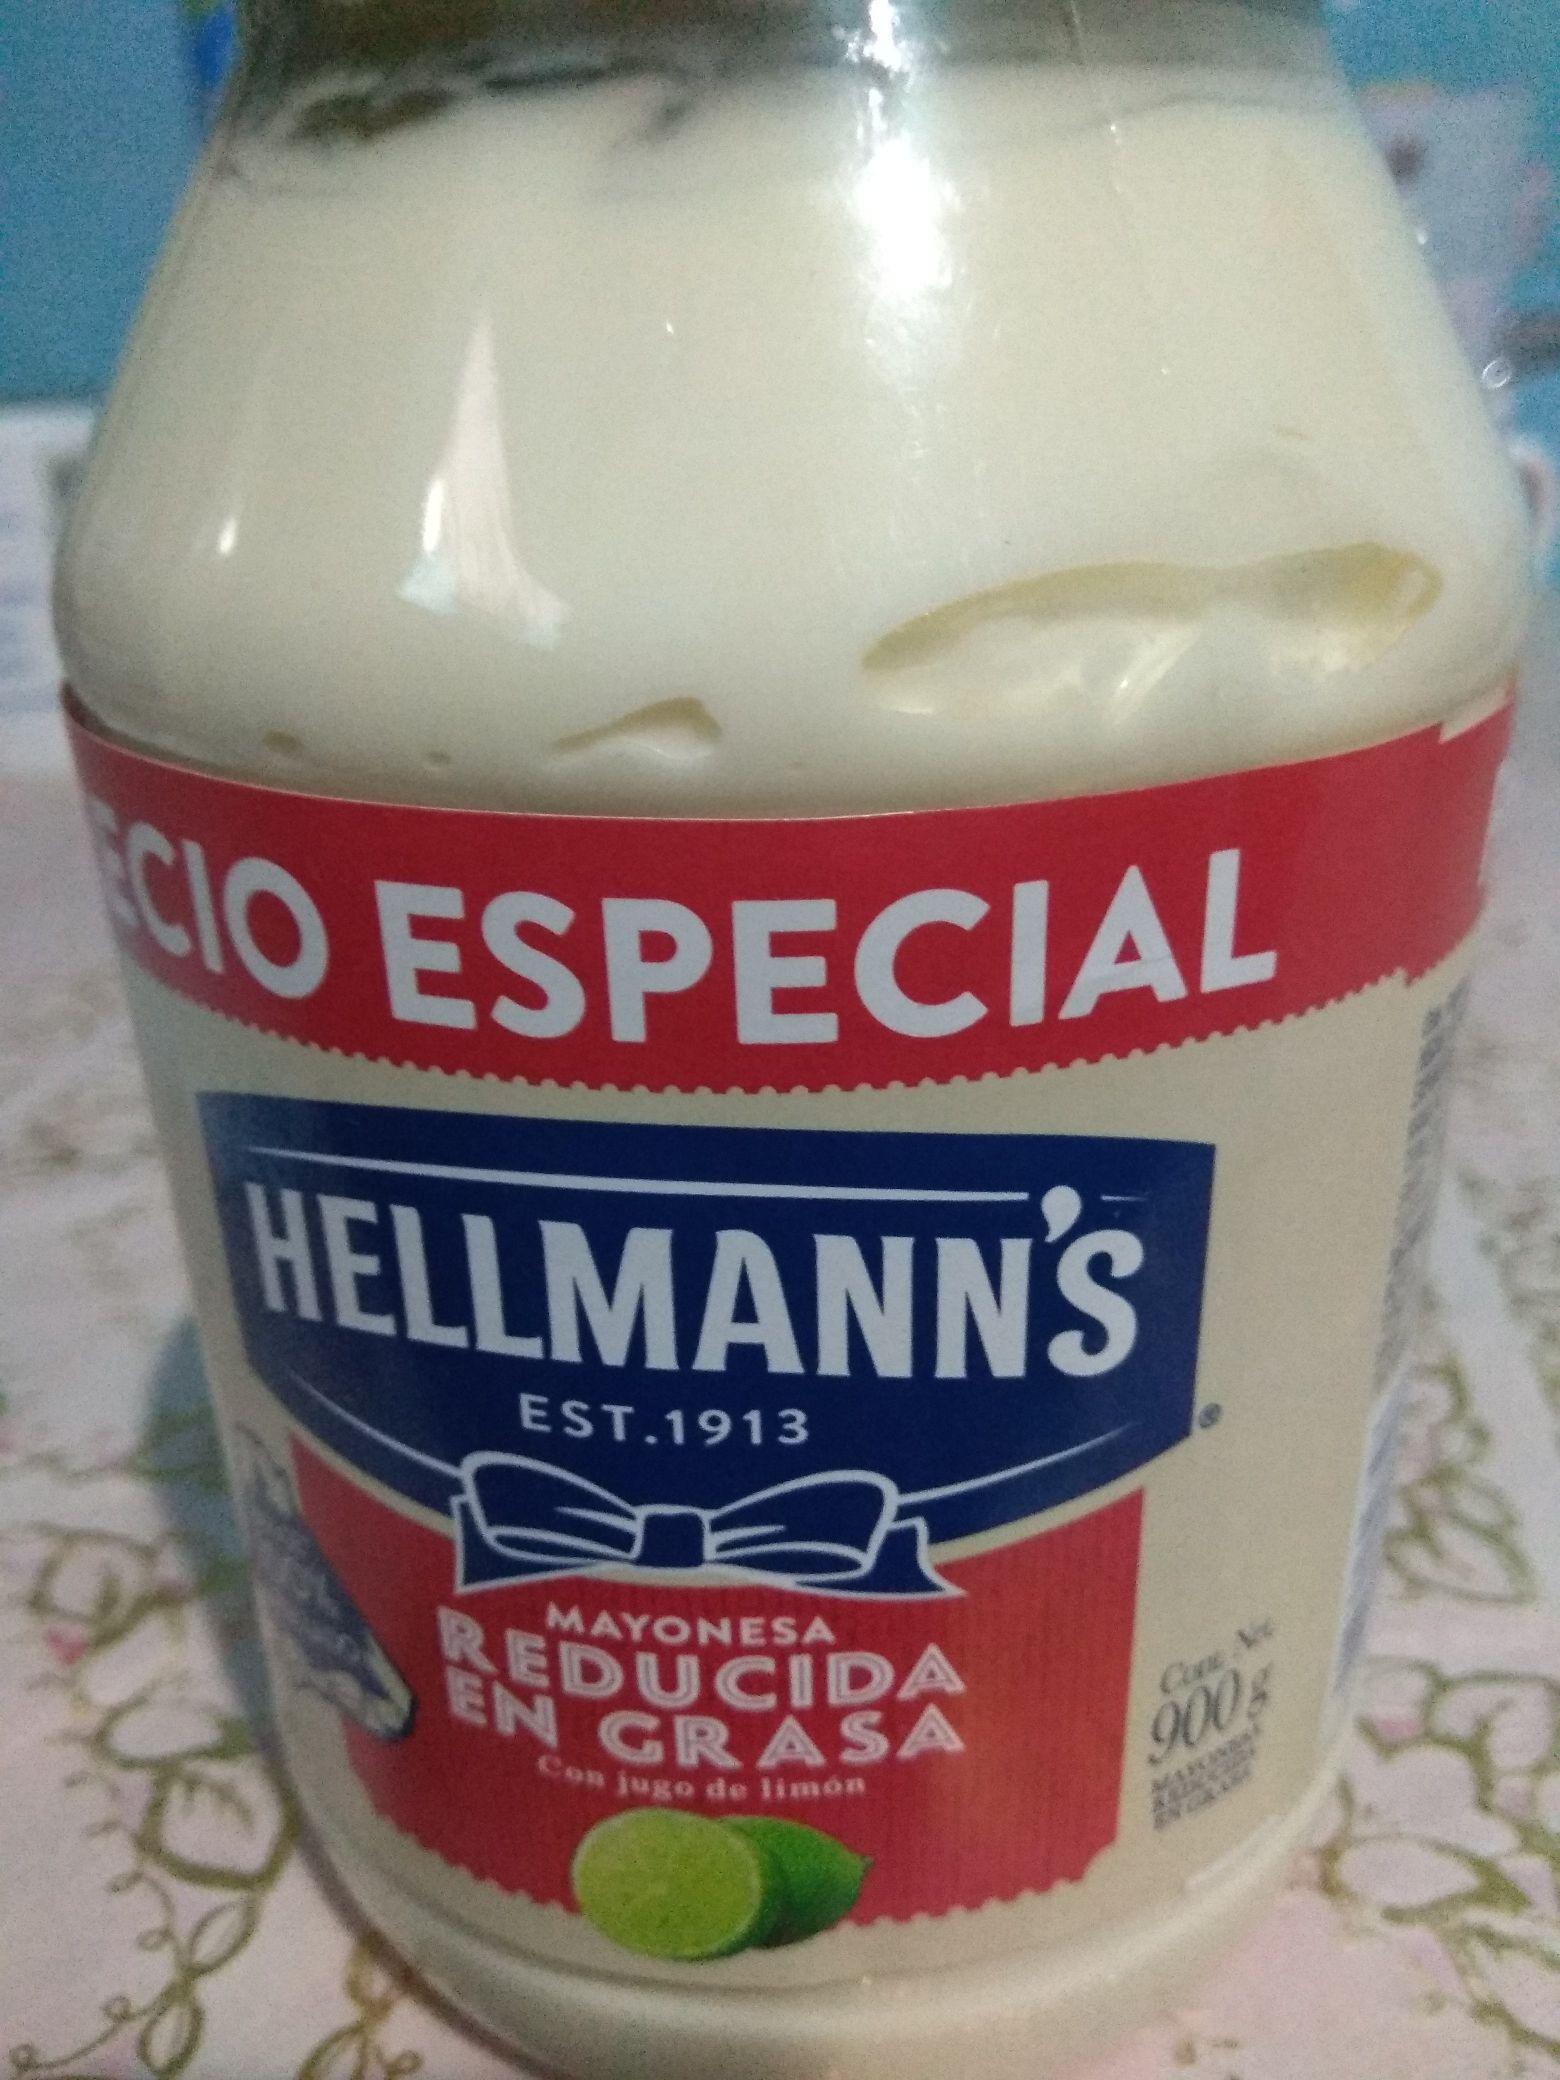 Walmart Hellmanns mayonesa 900g